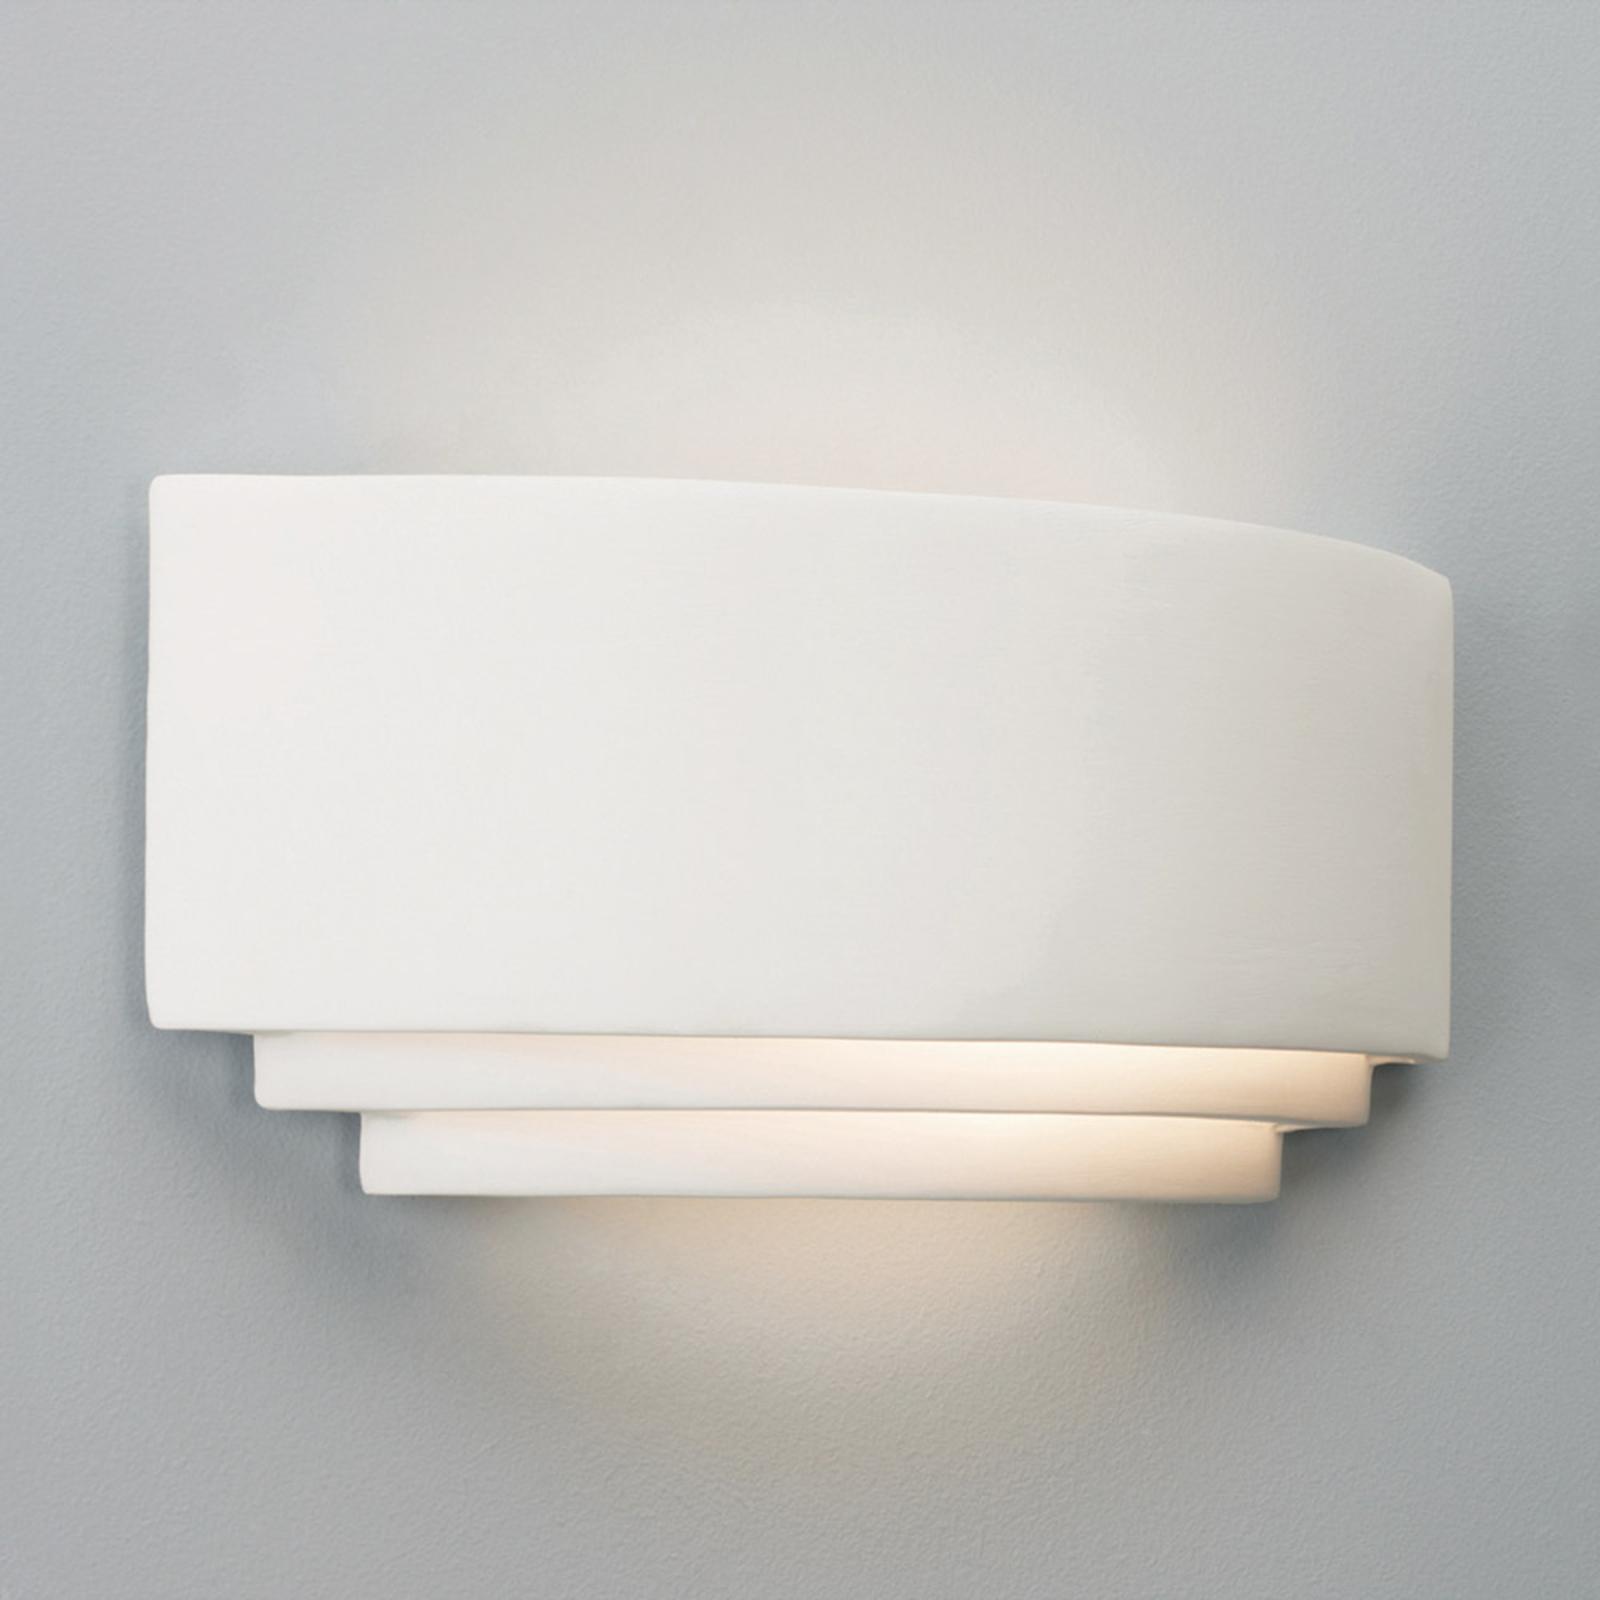 Enkel AMALFI vegglampe i keramikk